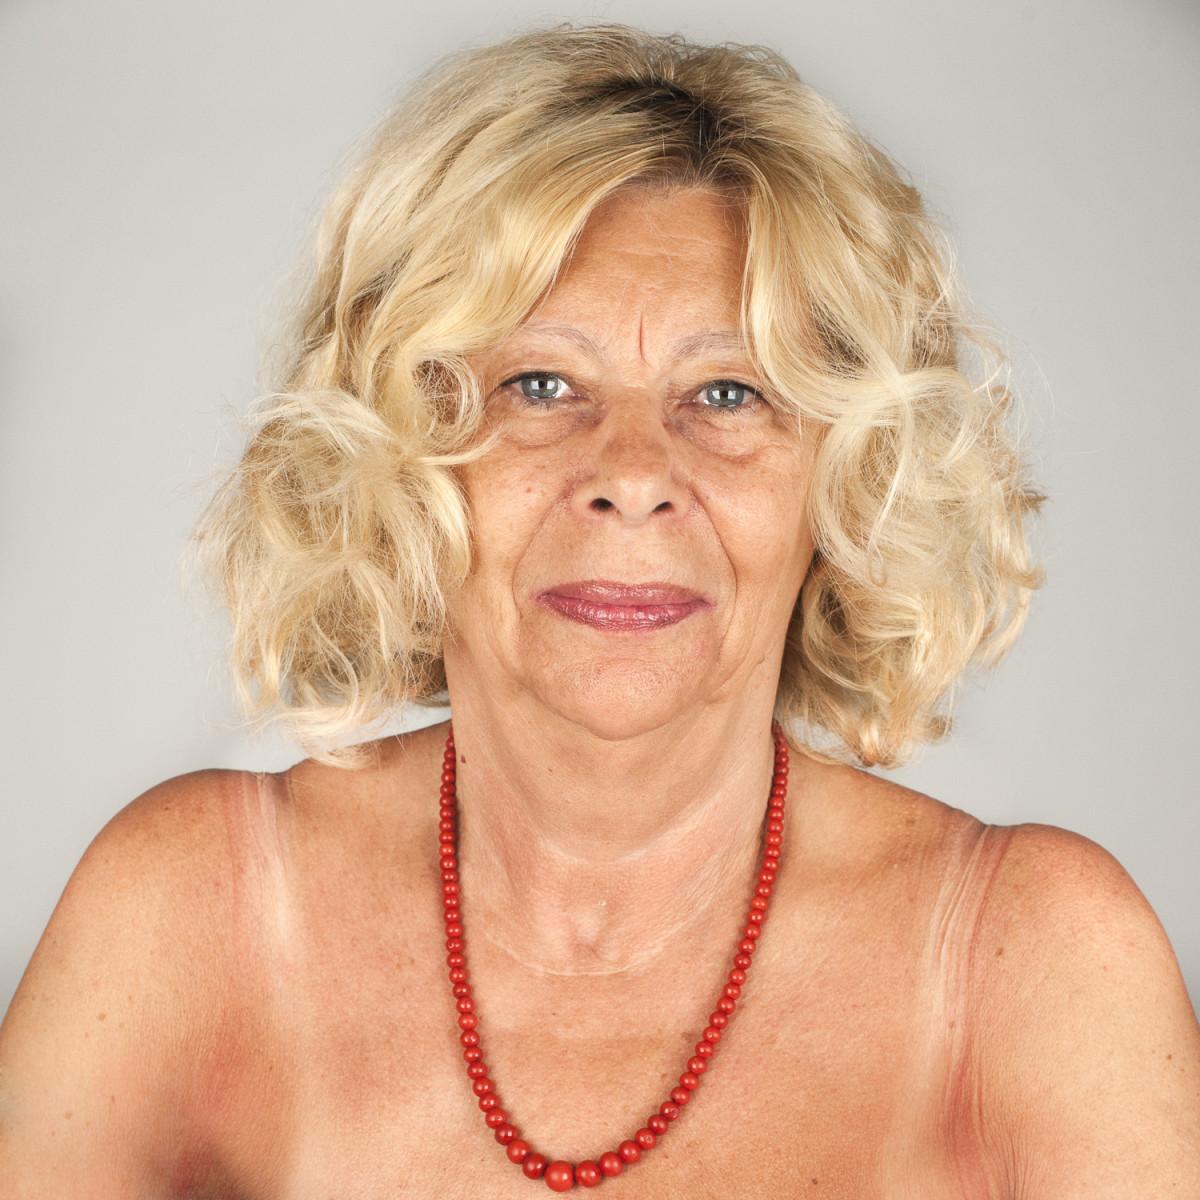 Gloria-Ghelfi-73-anni-pensionata-gloriosamente-ex-insegnante